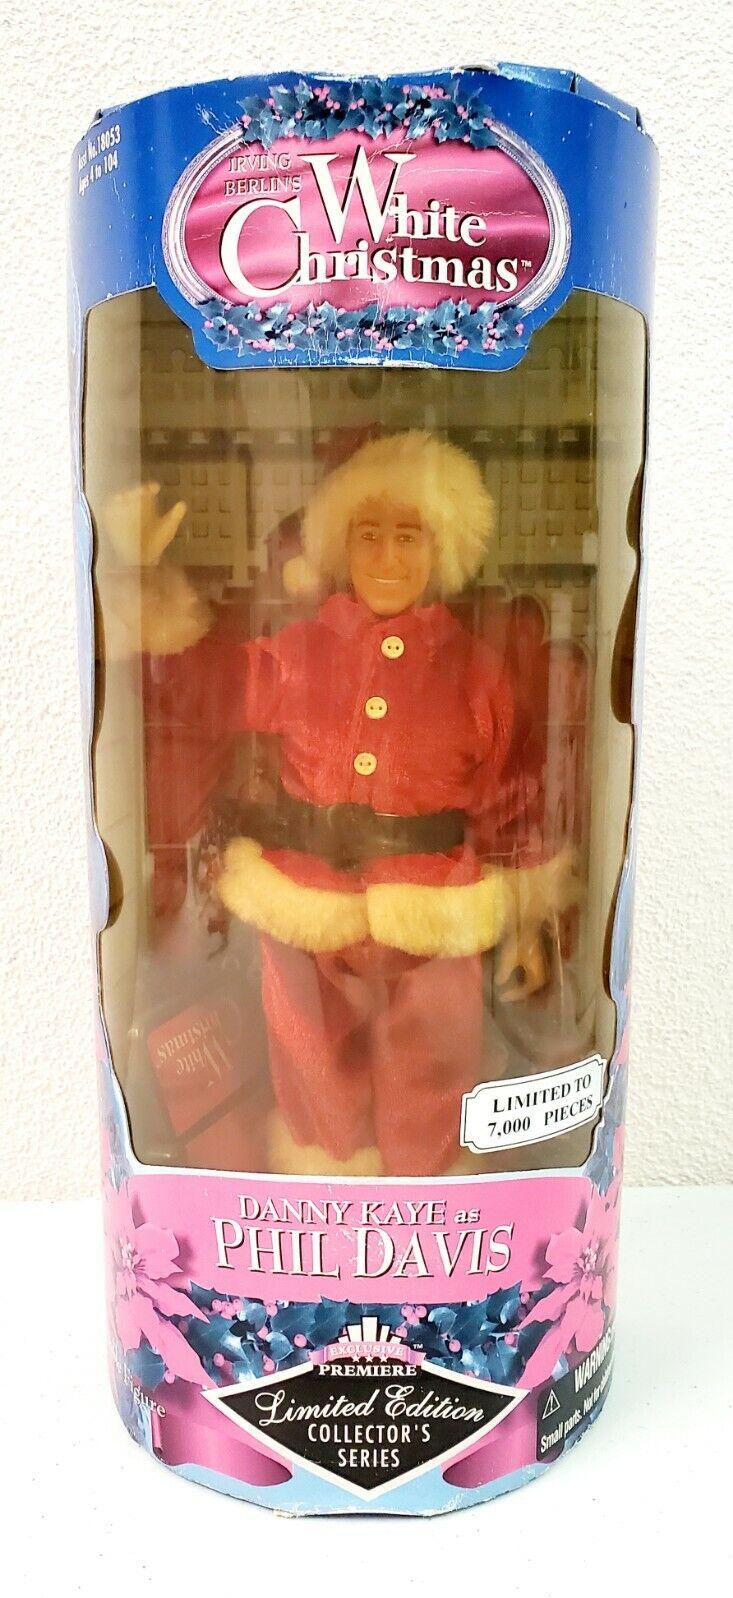 Exclusive Premiere White Christmas Danny Kaye as Phil Davis Doll